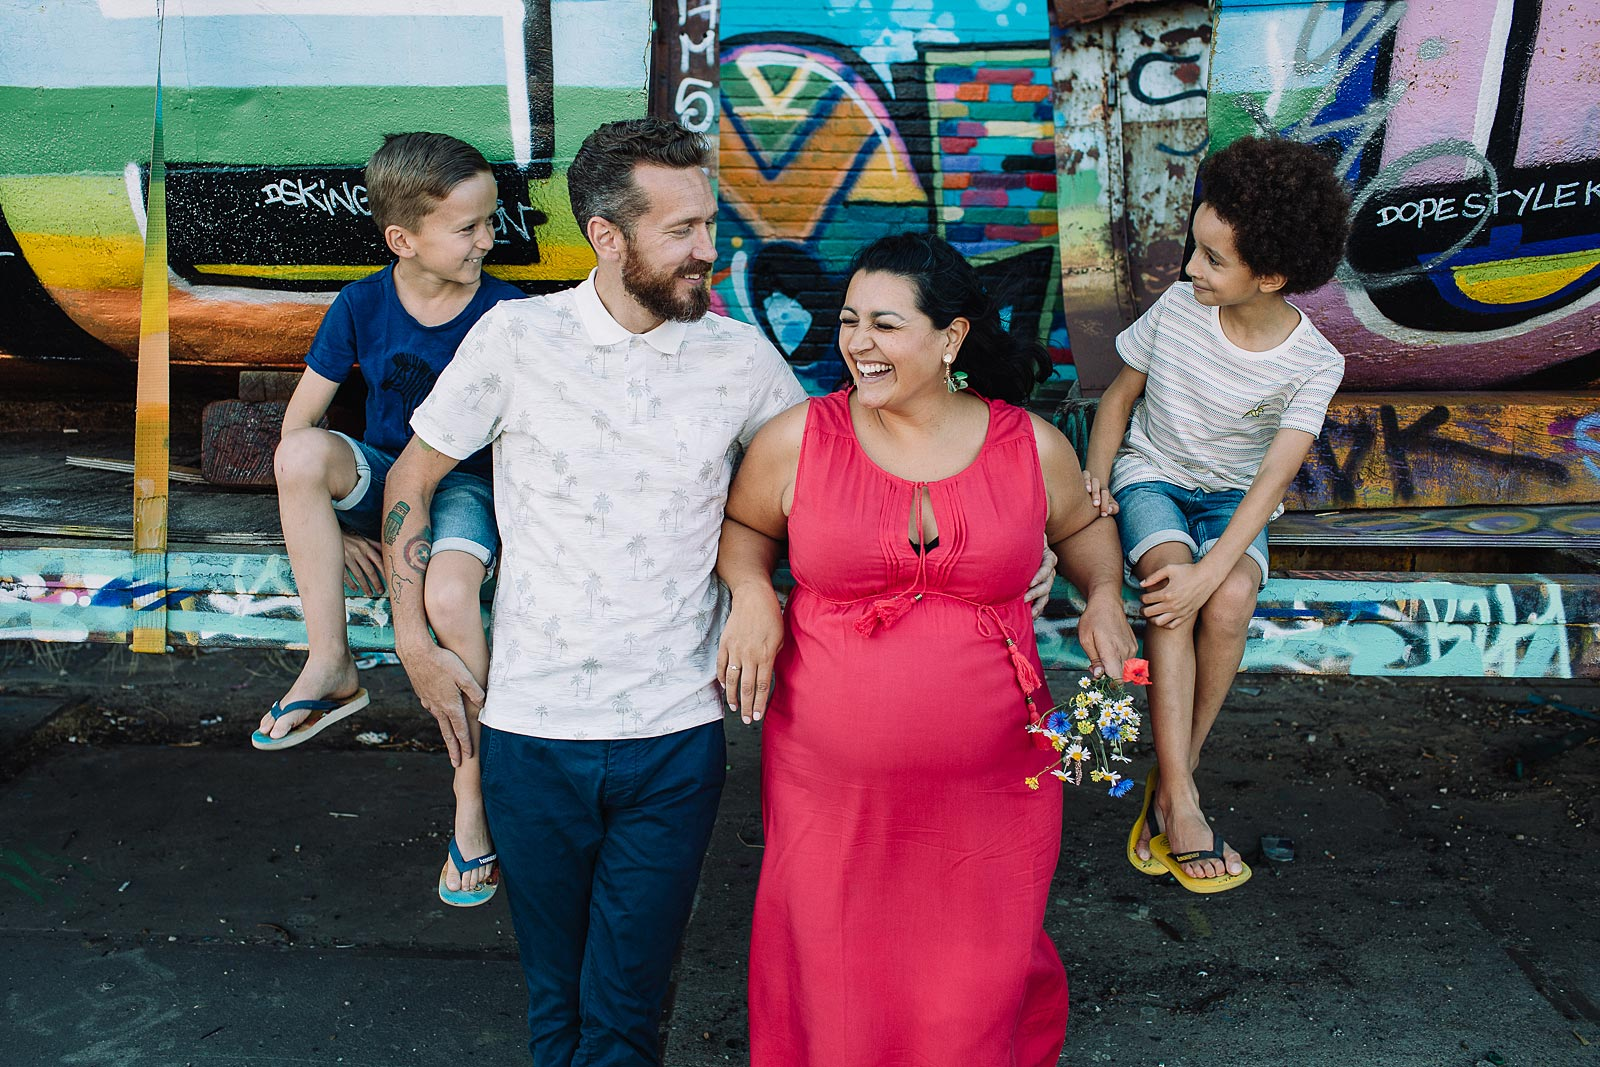 spontane zwangerschapsfotografie amsterdam